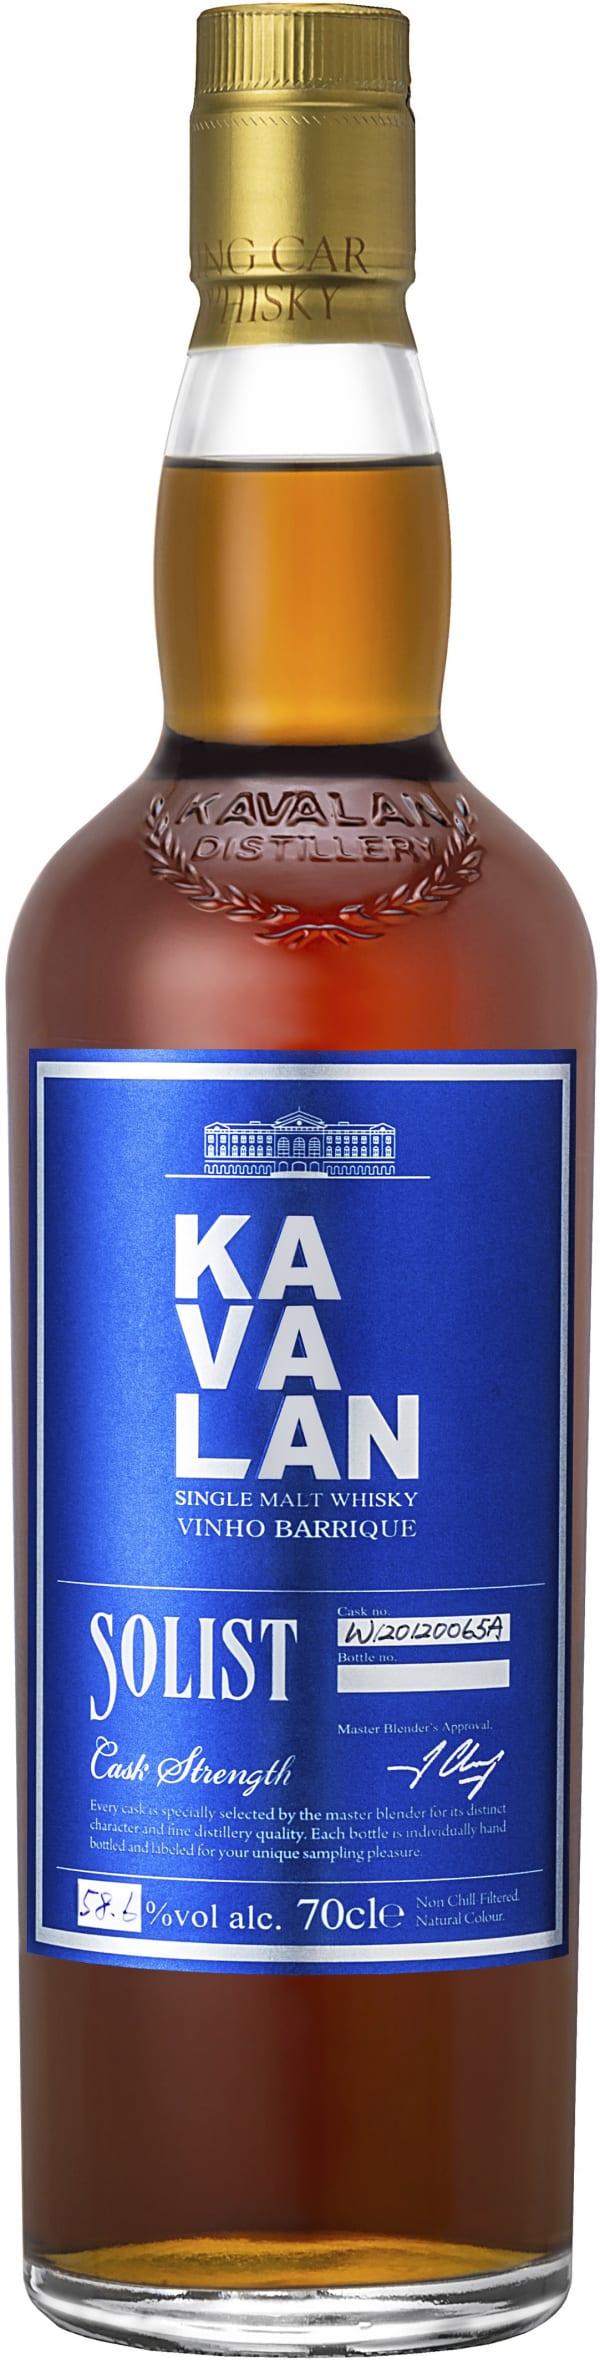 Kavalan Solist Vinho Barrique Cask Strength Single Malt